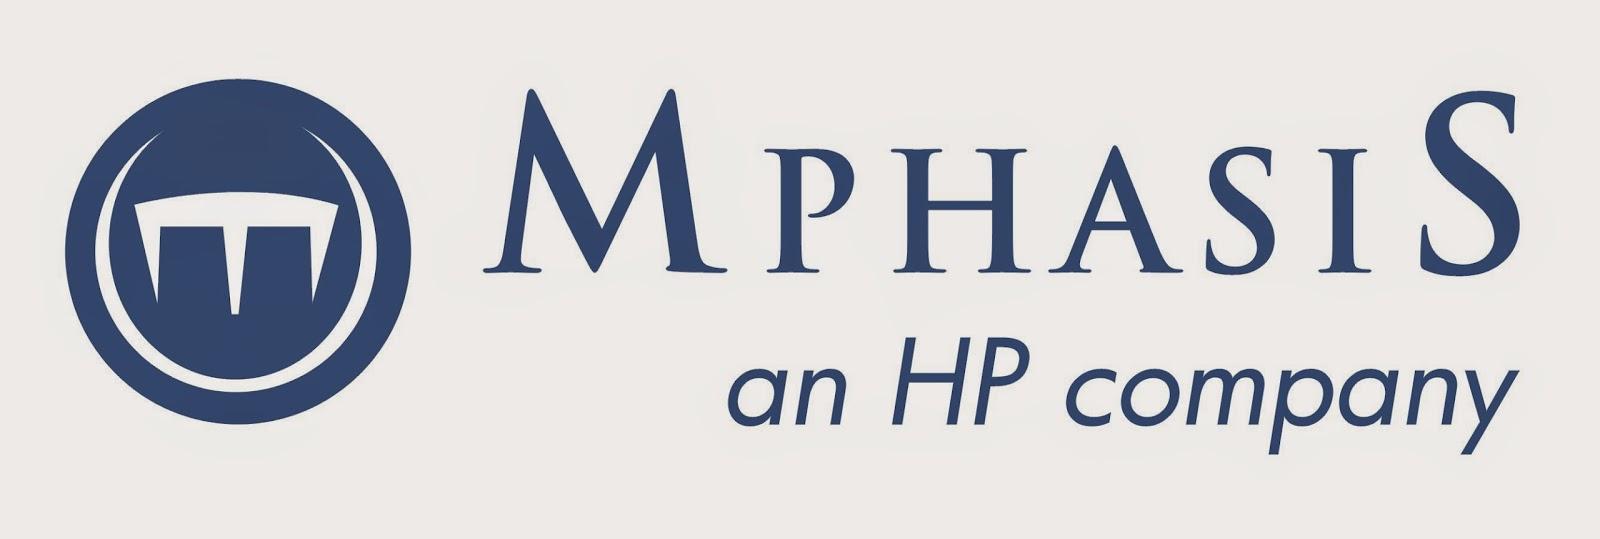 MphasiS-logo-images